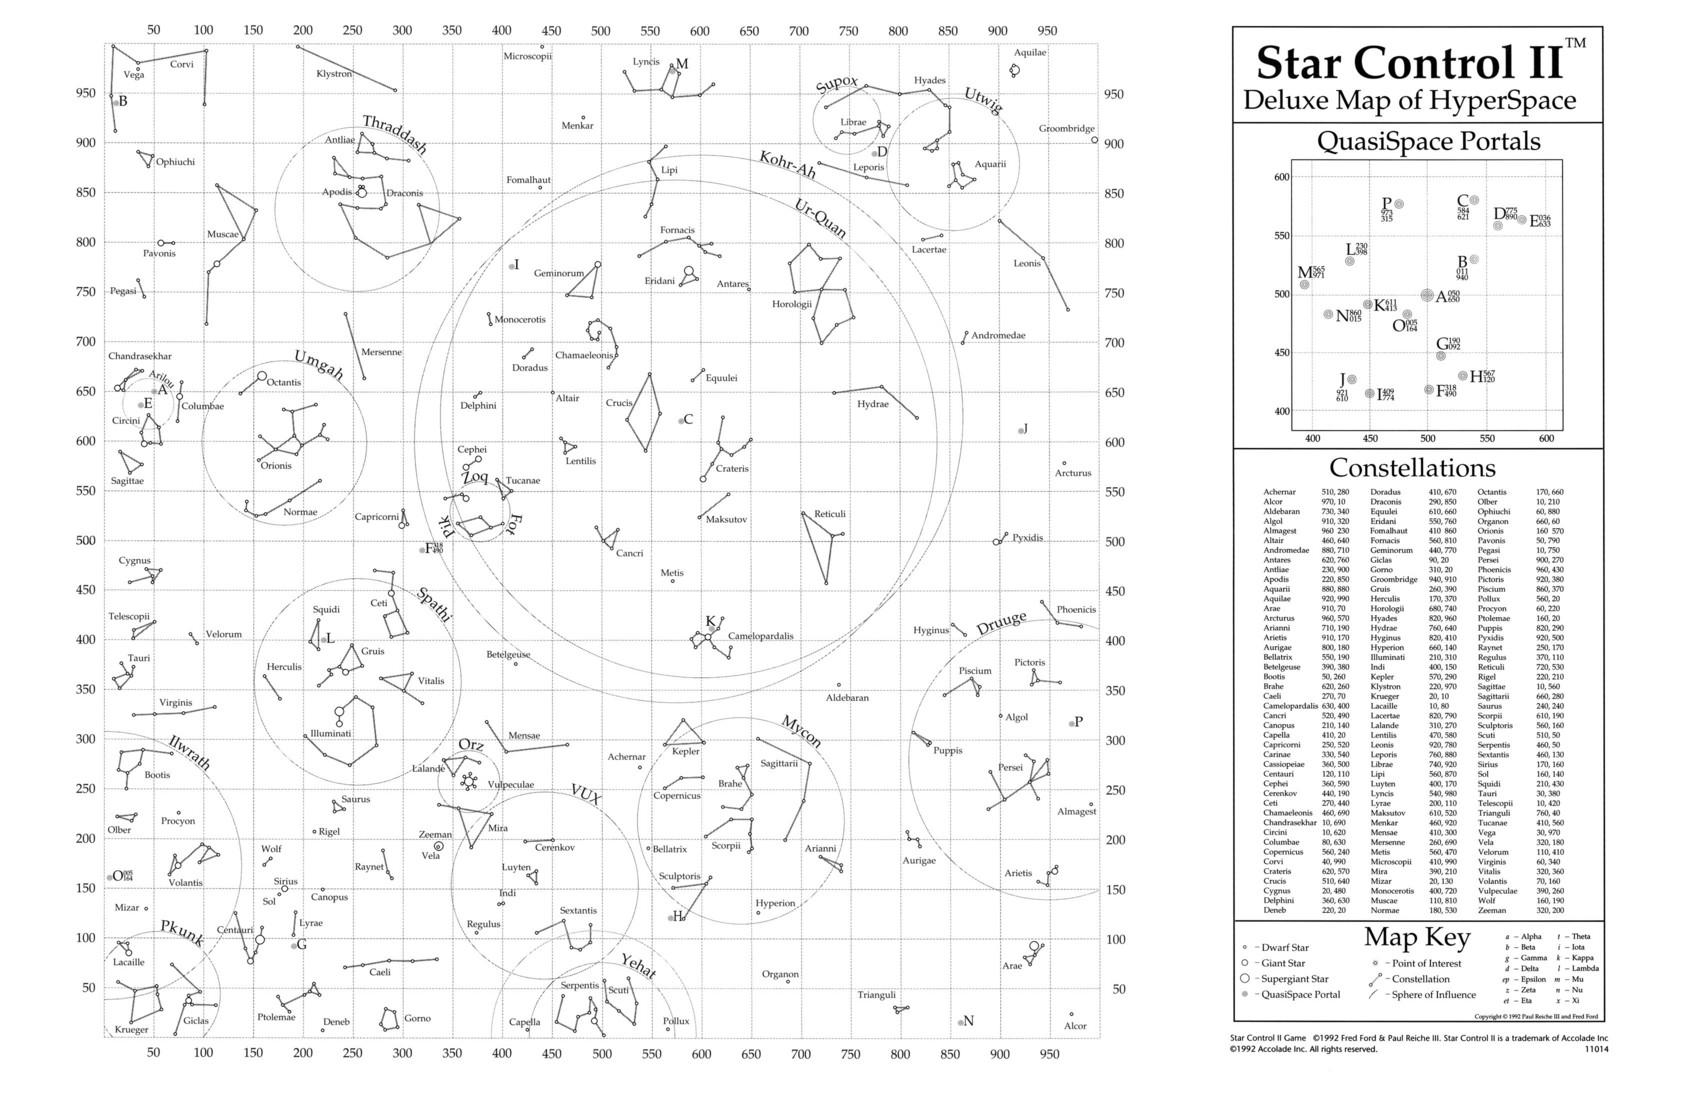 Star Control - Starmaps